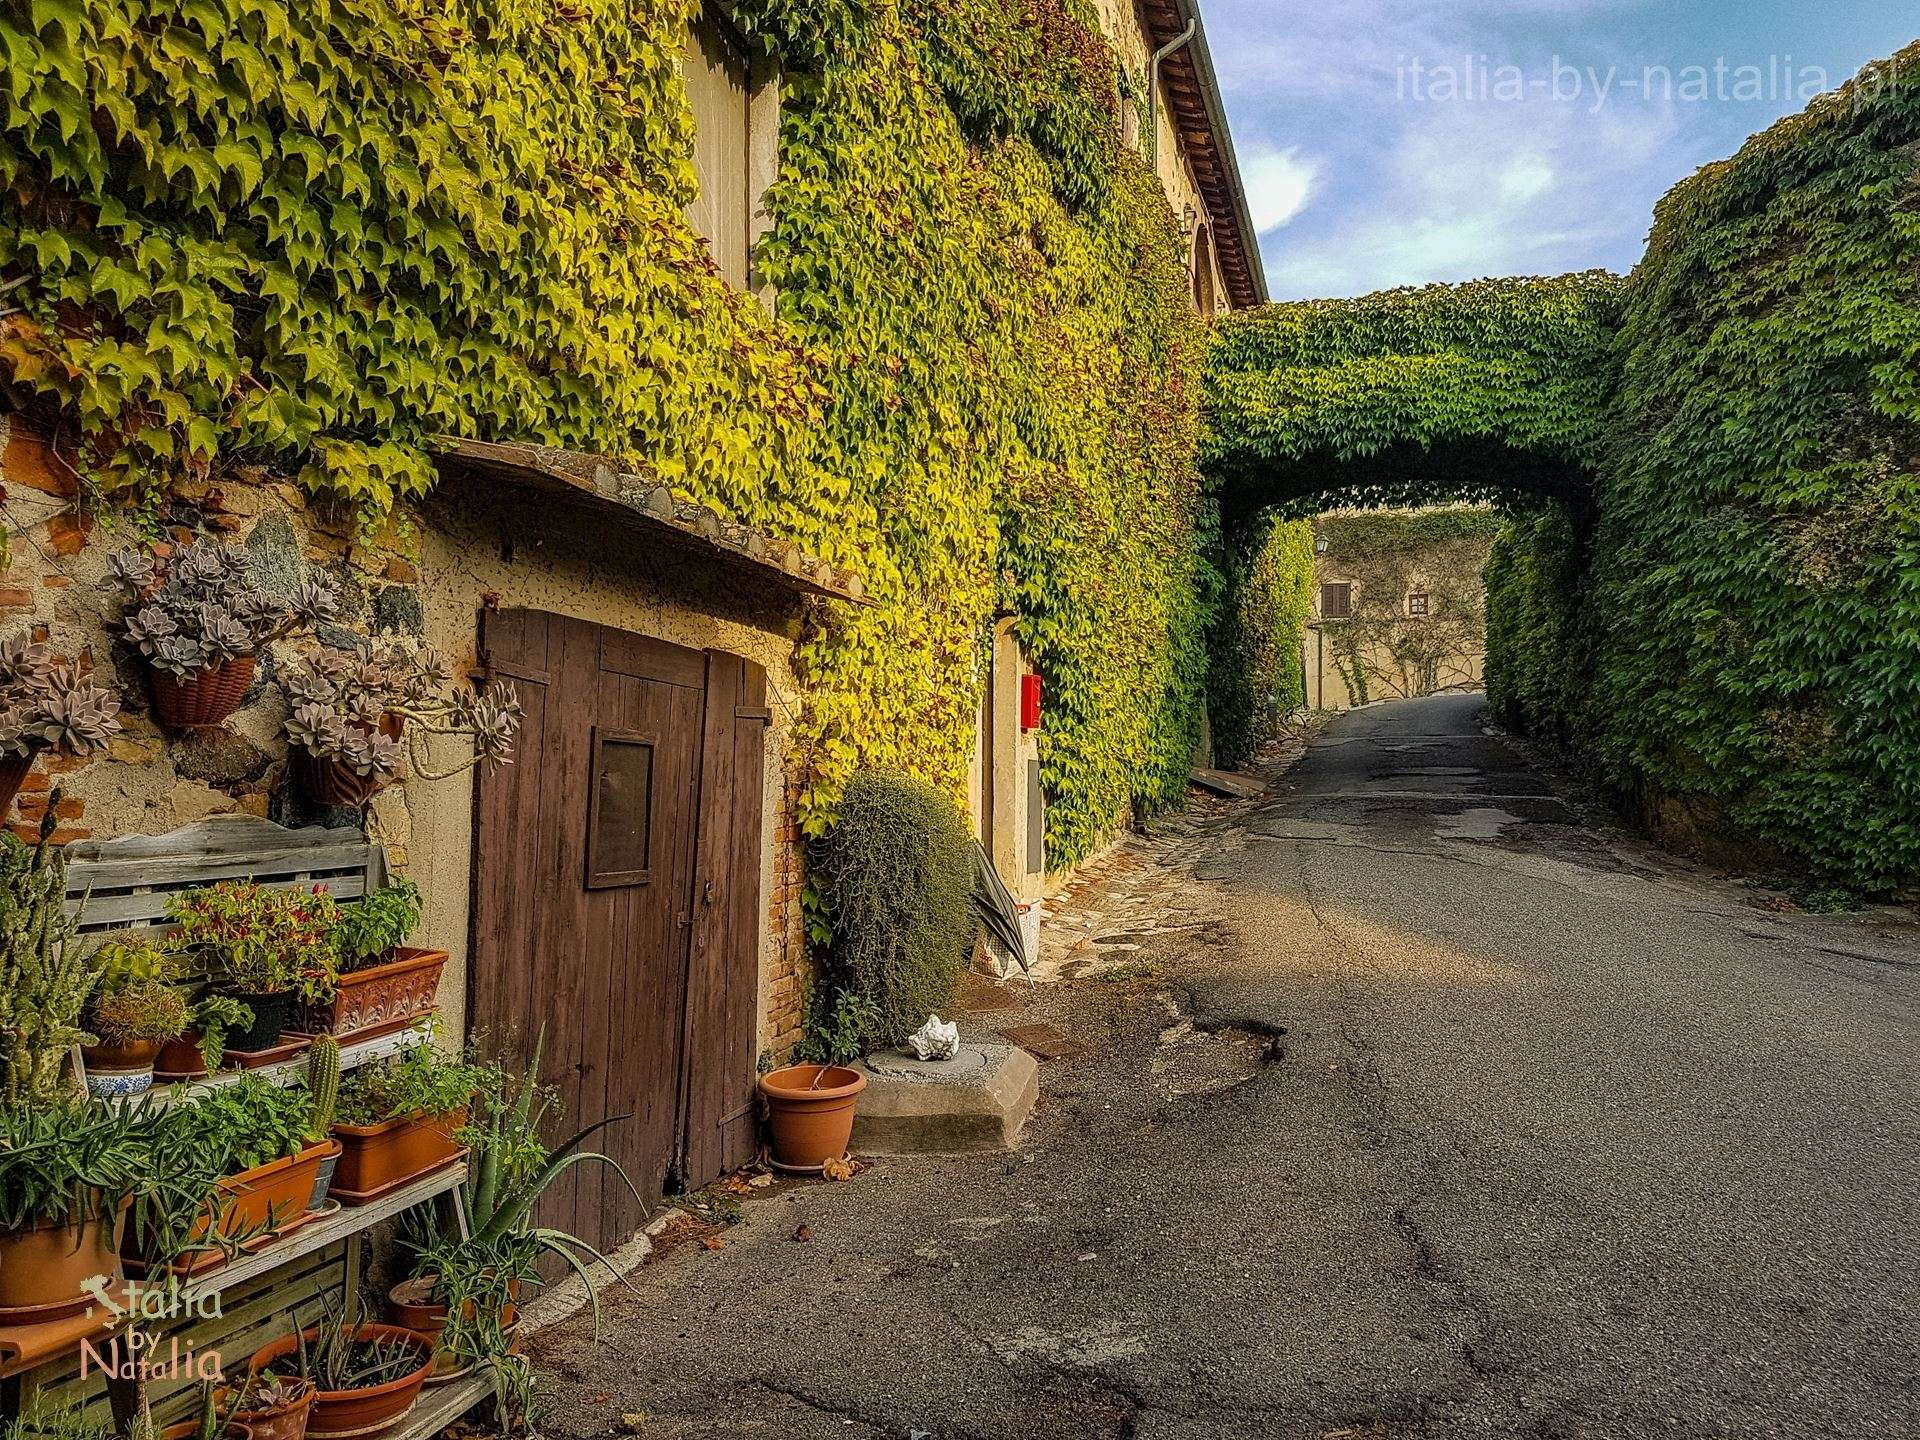 Querceto Toskania Val di Cecina małe miasteczko Prowincja Piza las